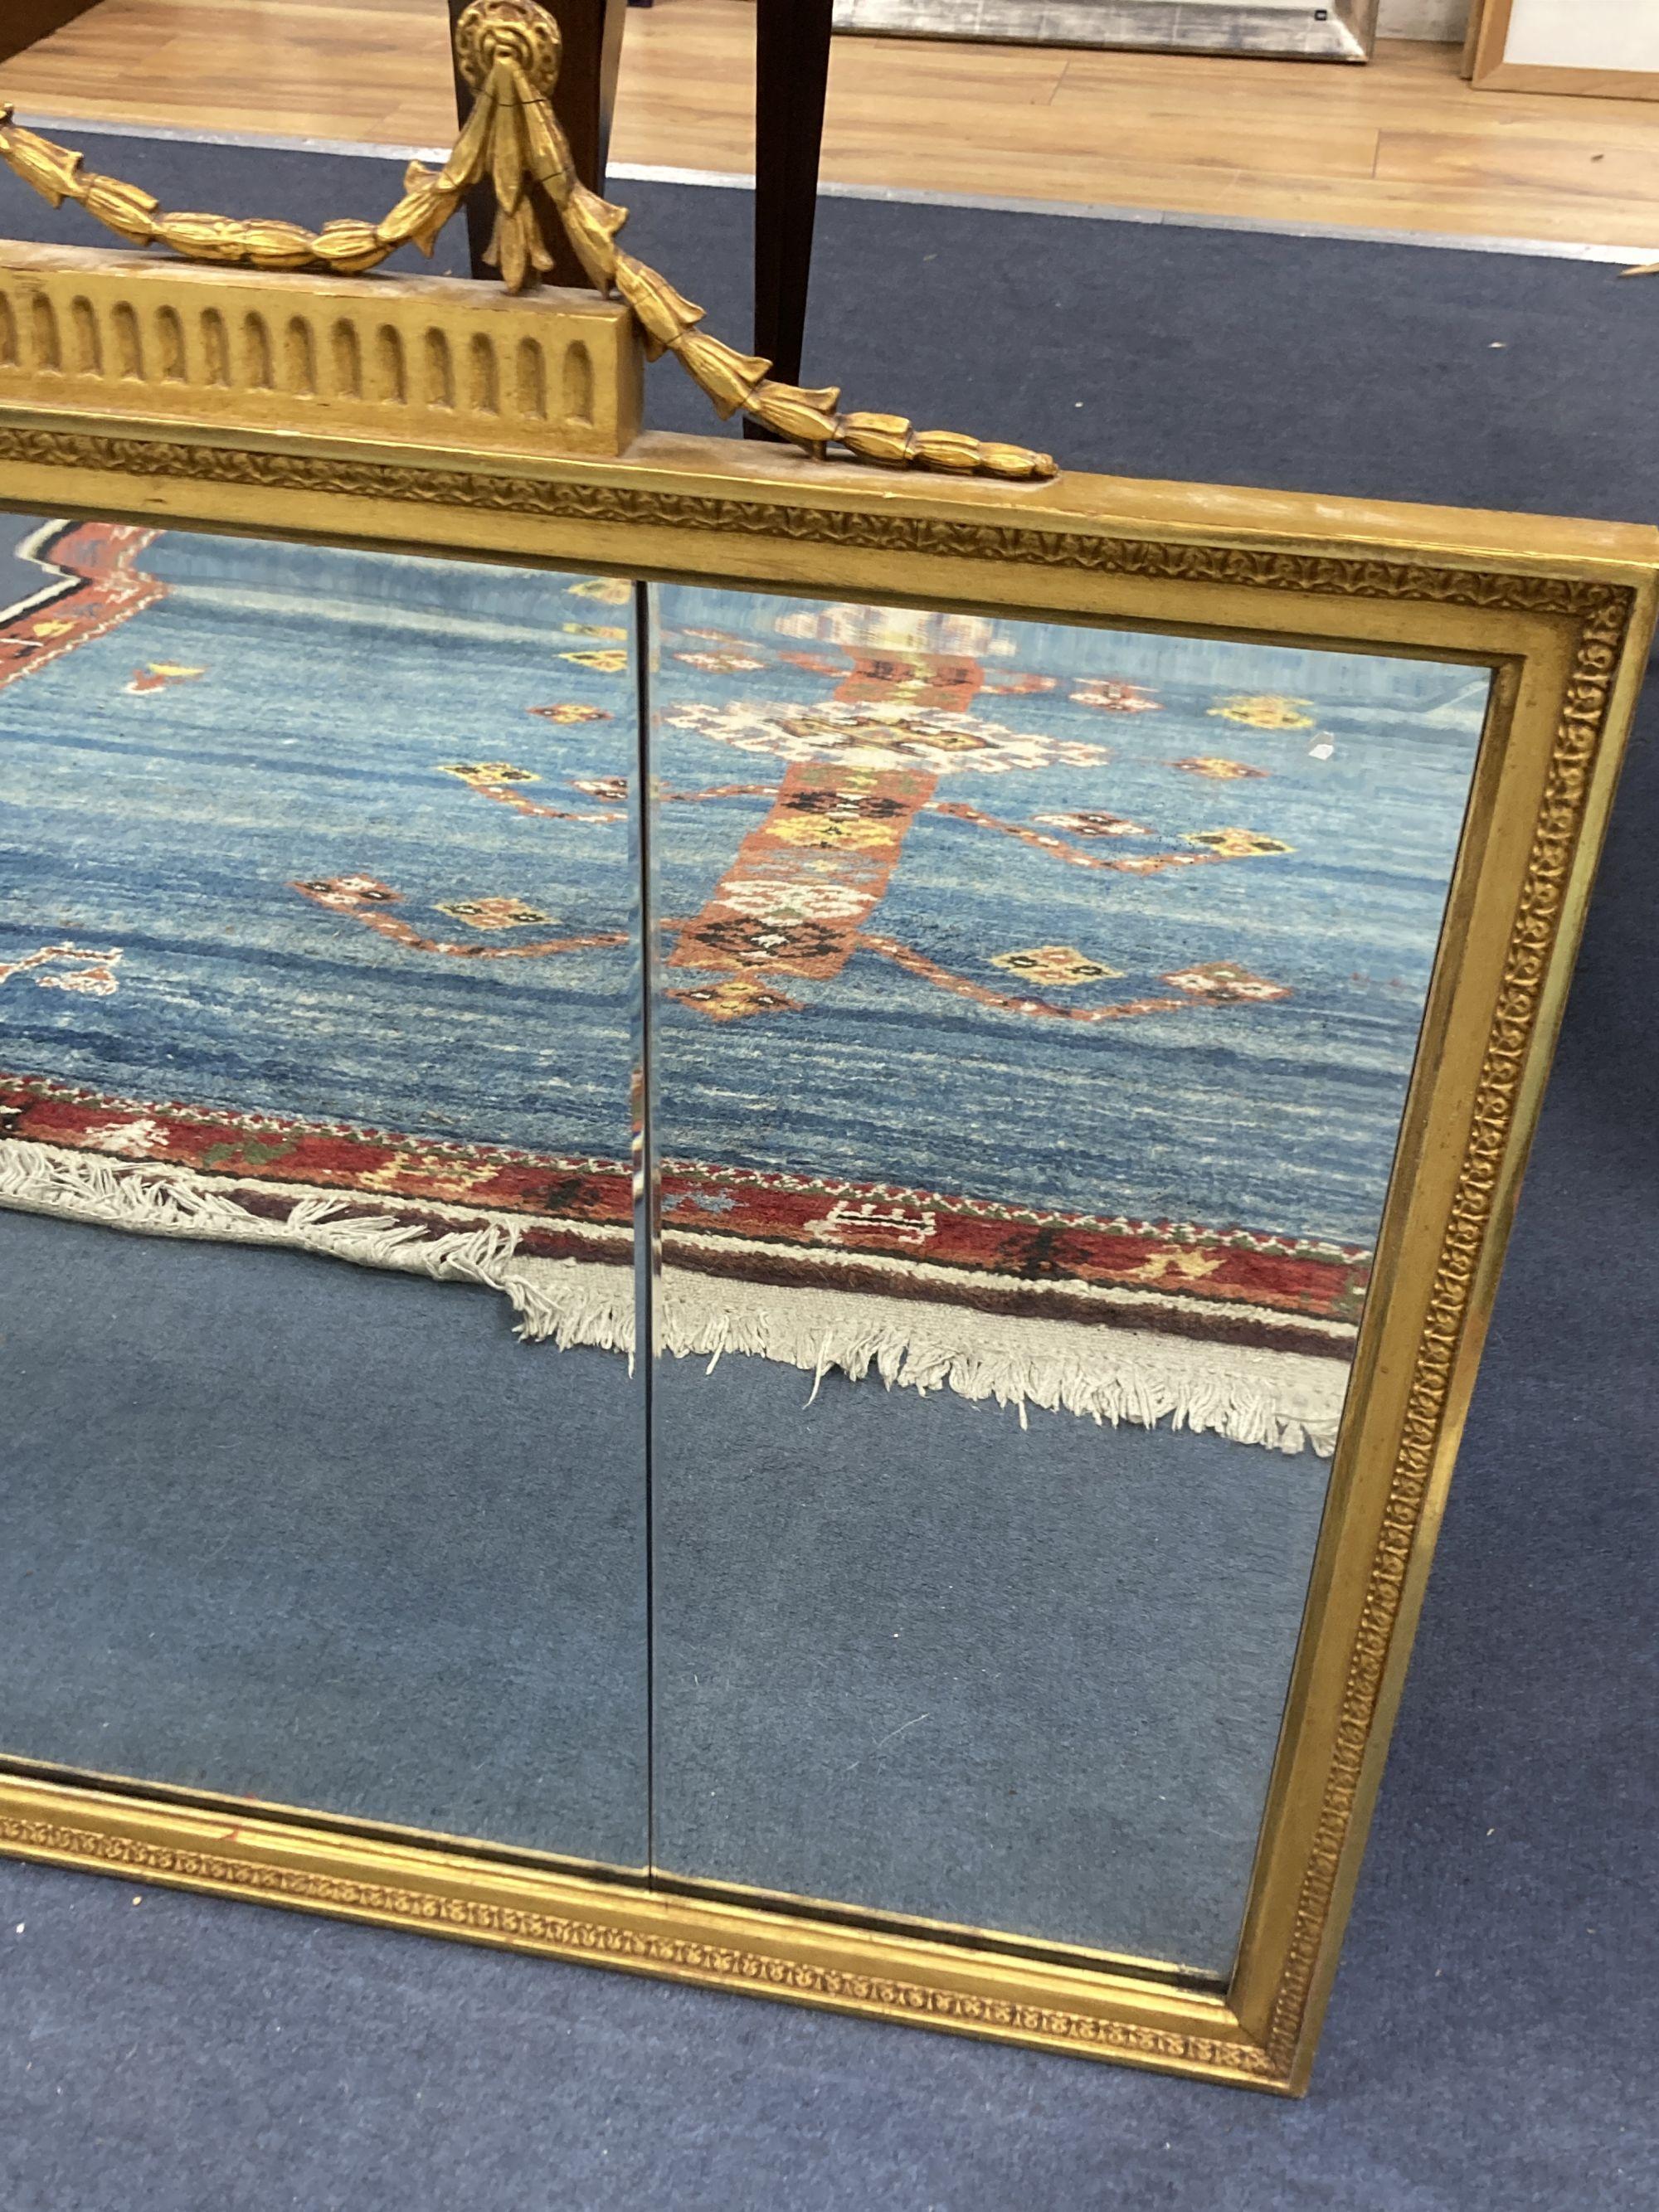 An Adam design gilt frame overmantel mirror, width 112cm, height 78cm - Image 3 of 3